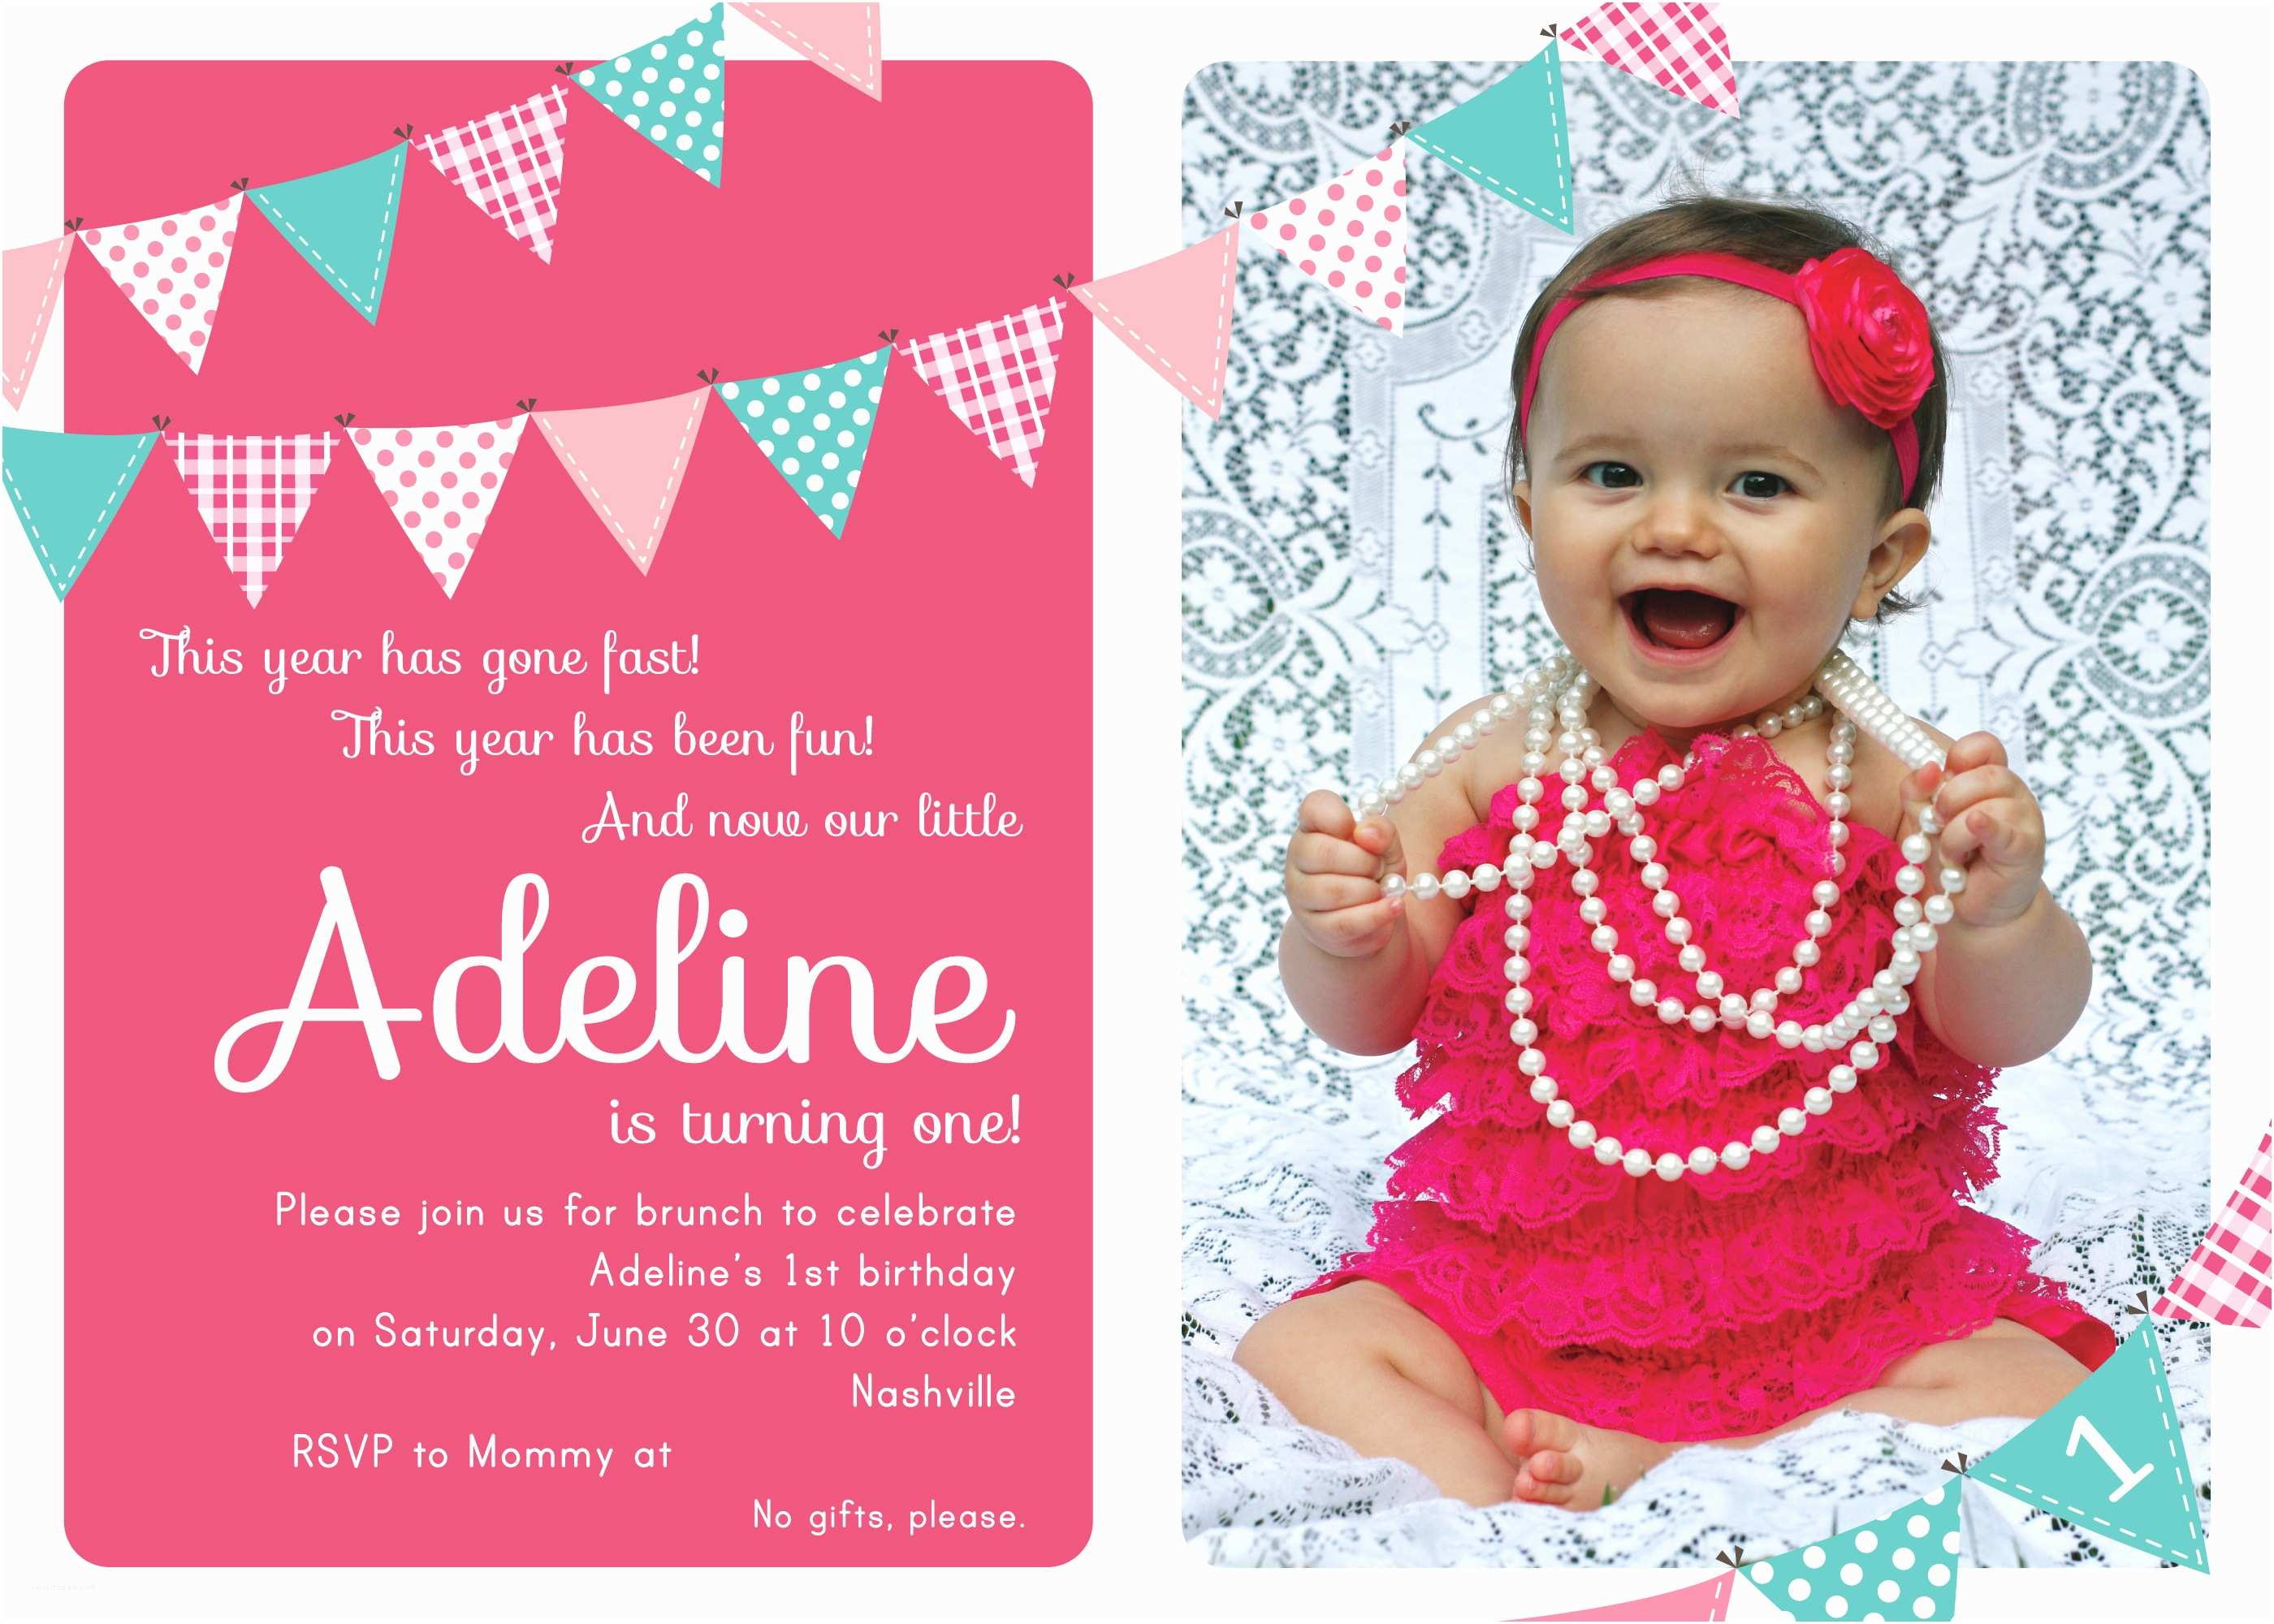 Baby Birthday Invitations Girls 1st Invitation Cards Ideas